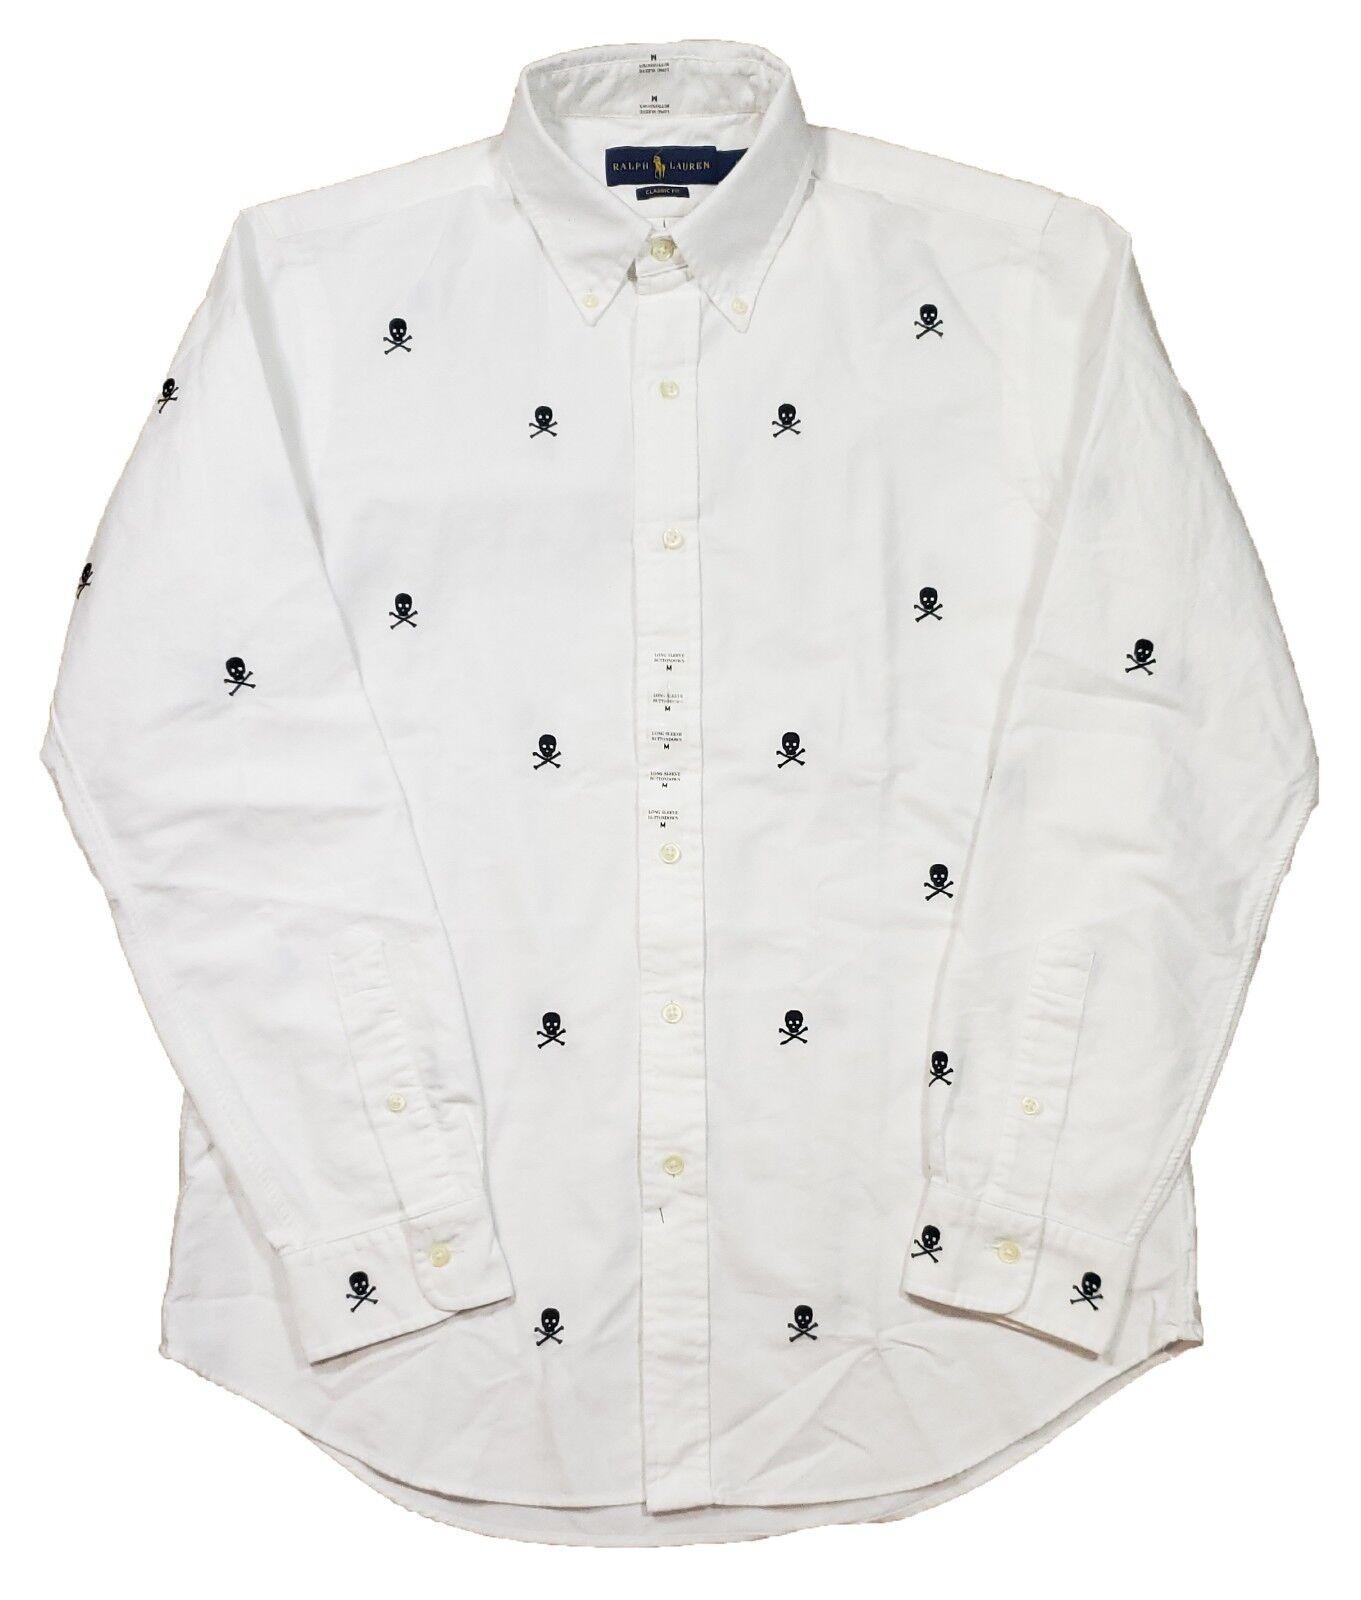 Polo Ralph Lauren Men's White Skull Embroidered Classic Fit Long Sleeve Shirt